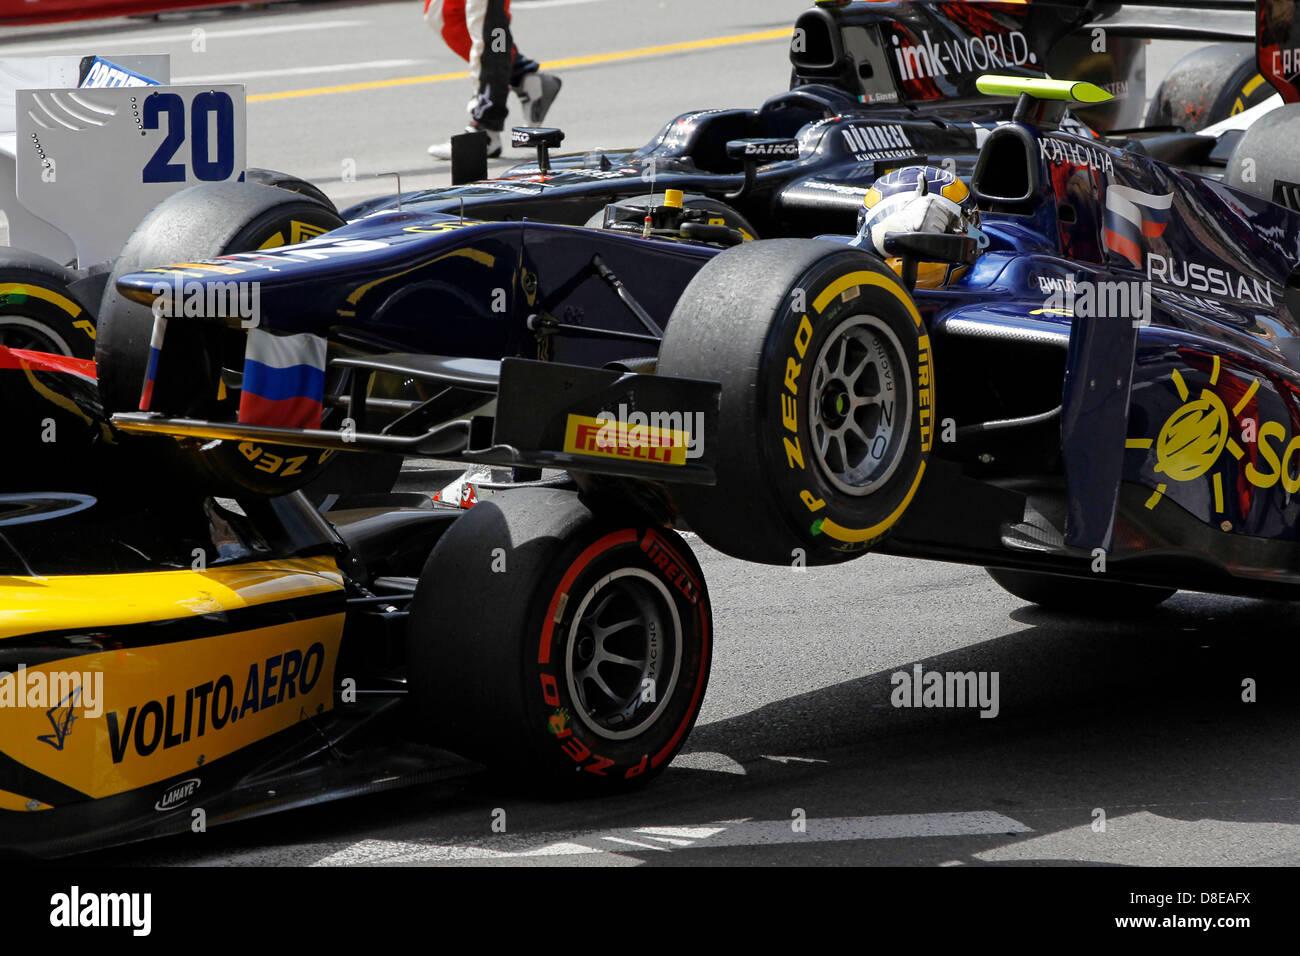 ericsson motorsport